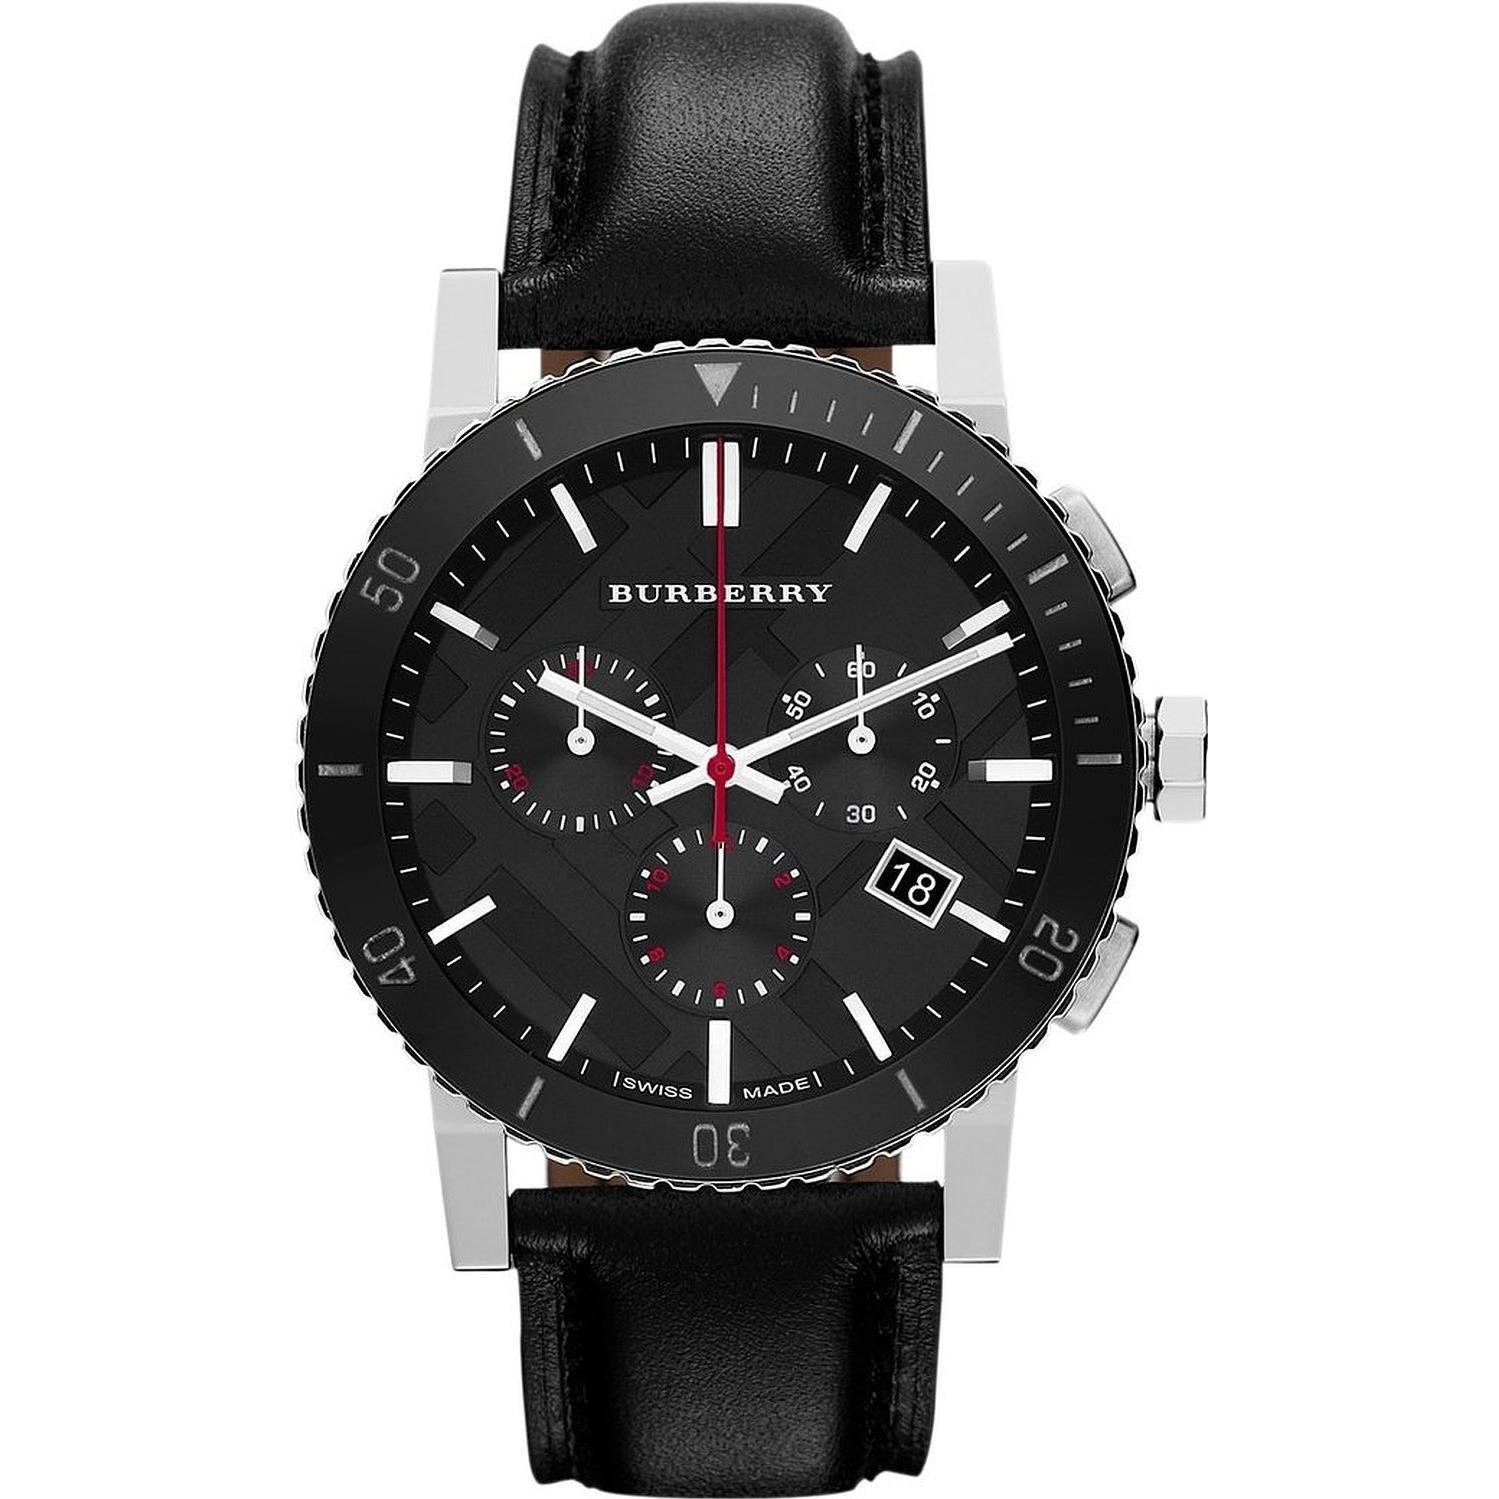 216ace9ec261 Amazon.com: Burberry Black Dial Chronograph Black Leather Mens Watch  BU9382: Burberry: Watches